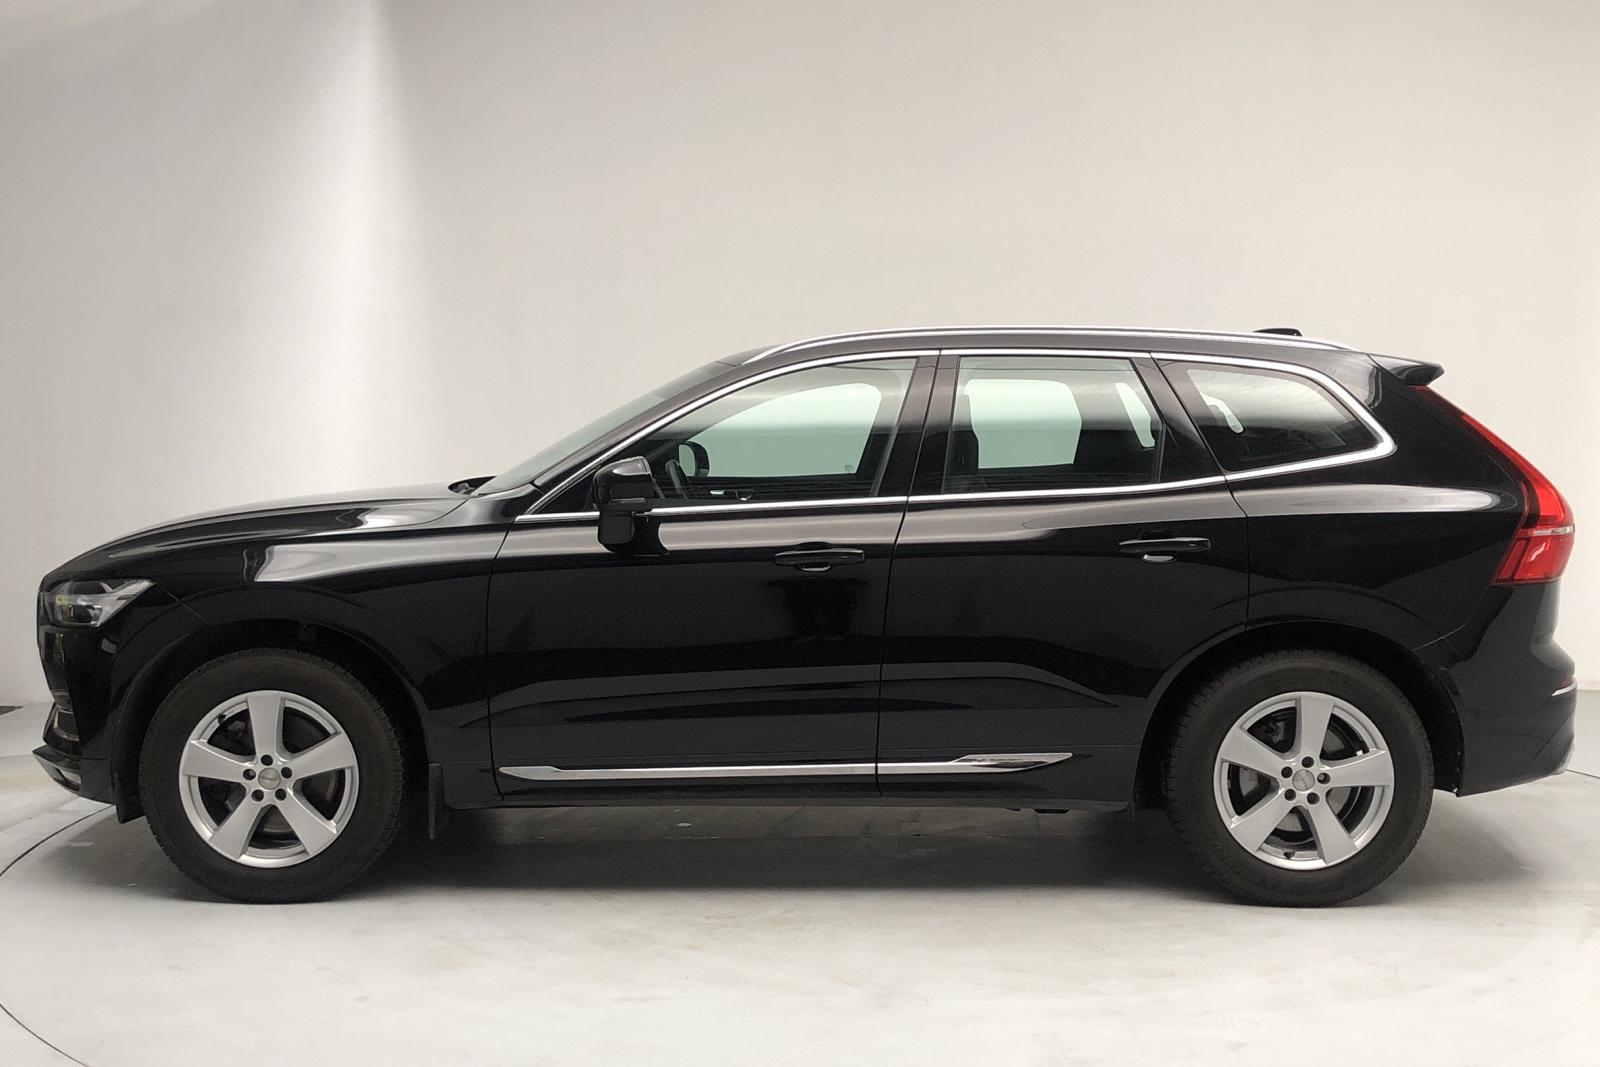 Volvo XC60 D4 AWD (190hk) - 6 869 mil - Automat - svart - 2018